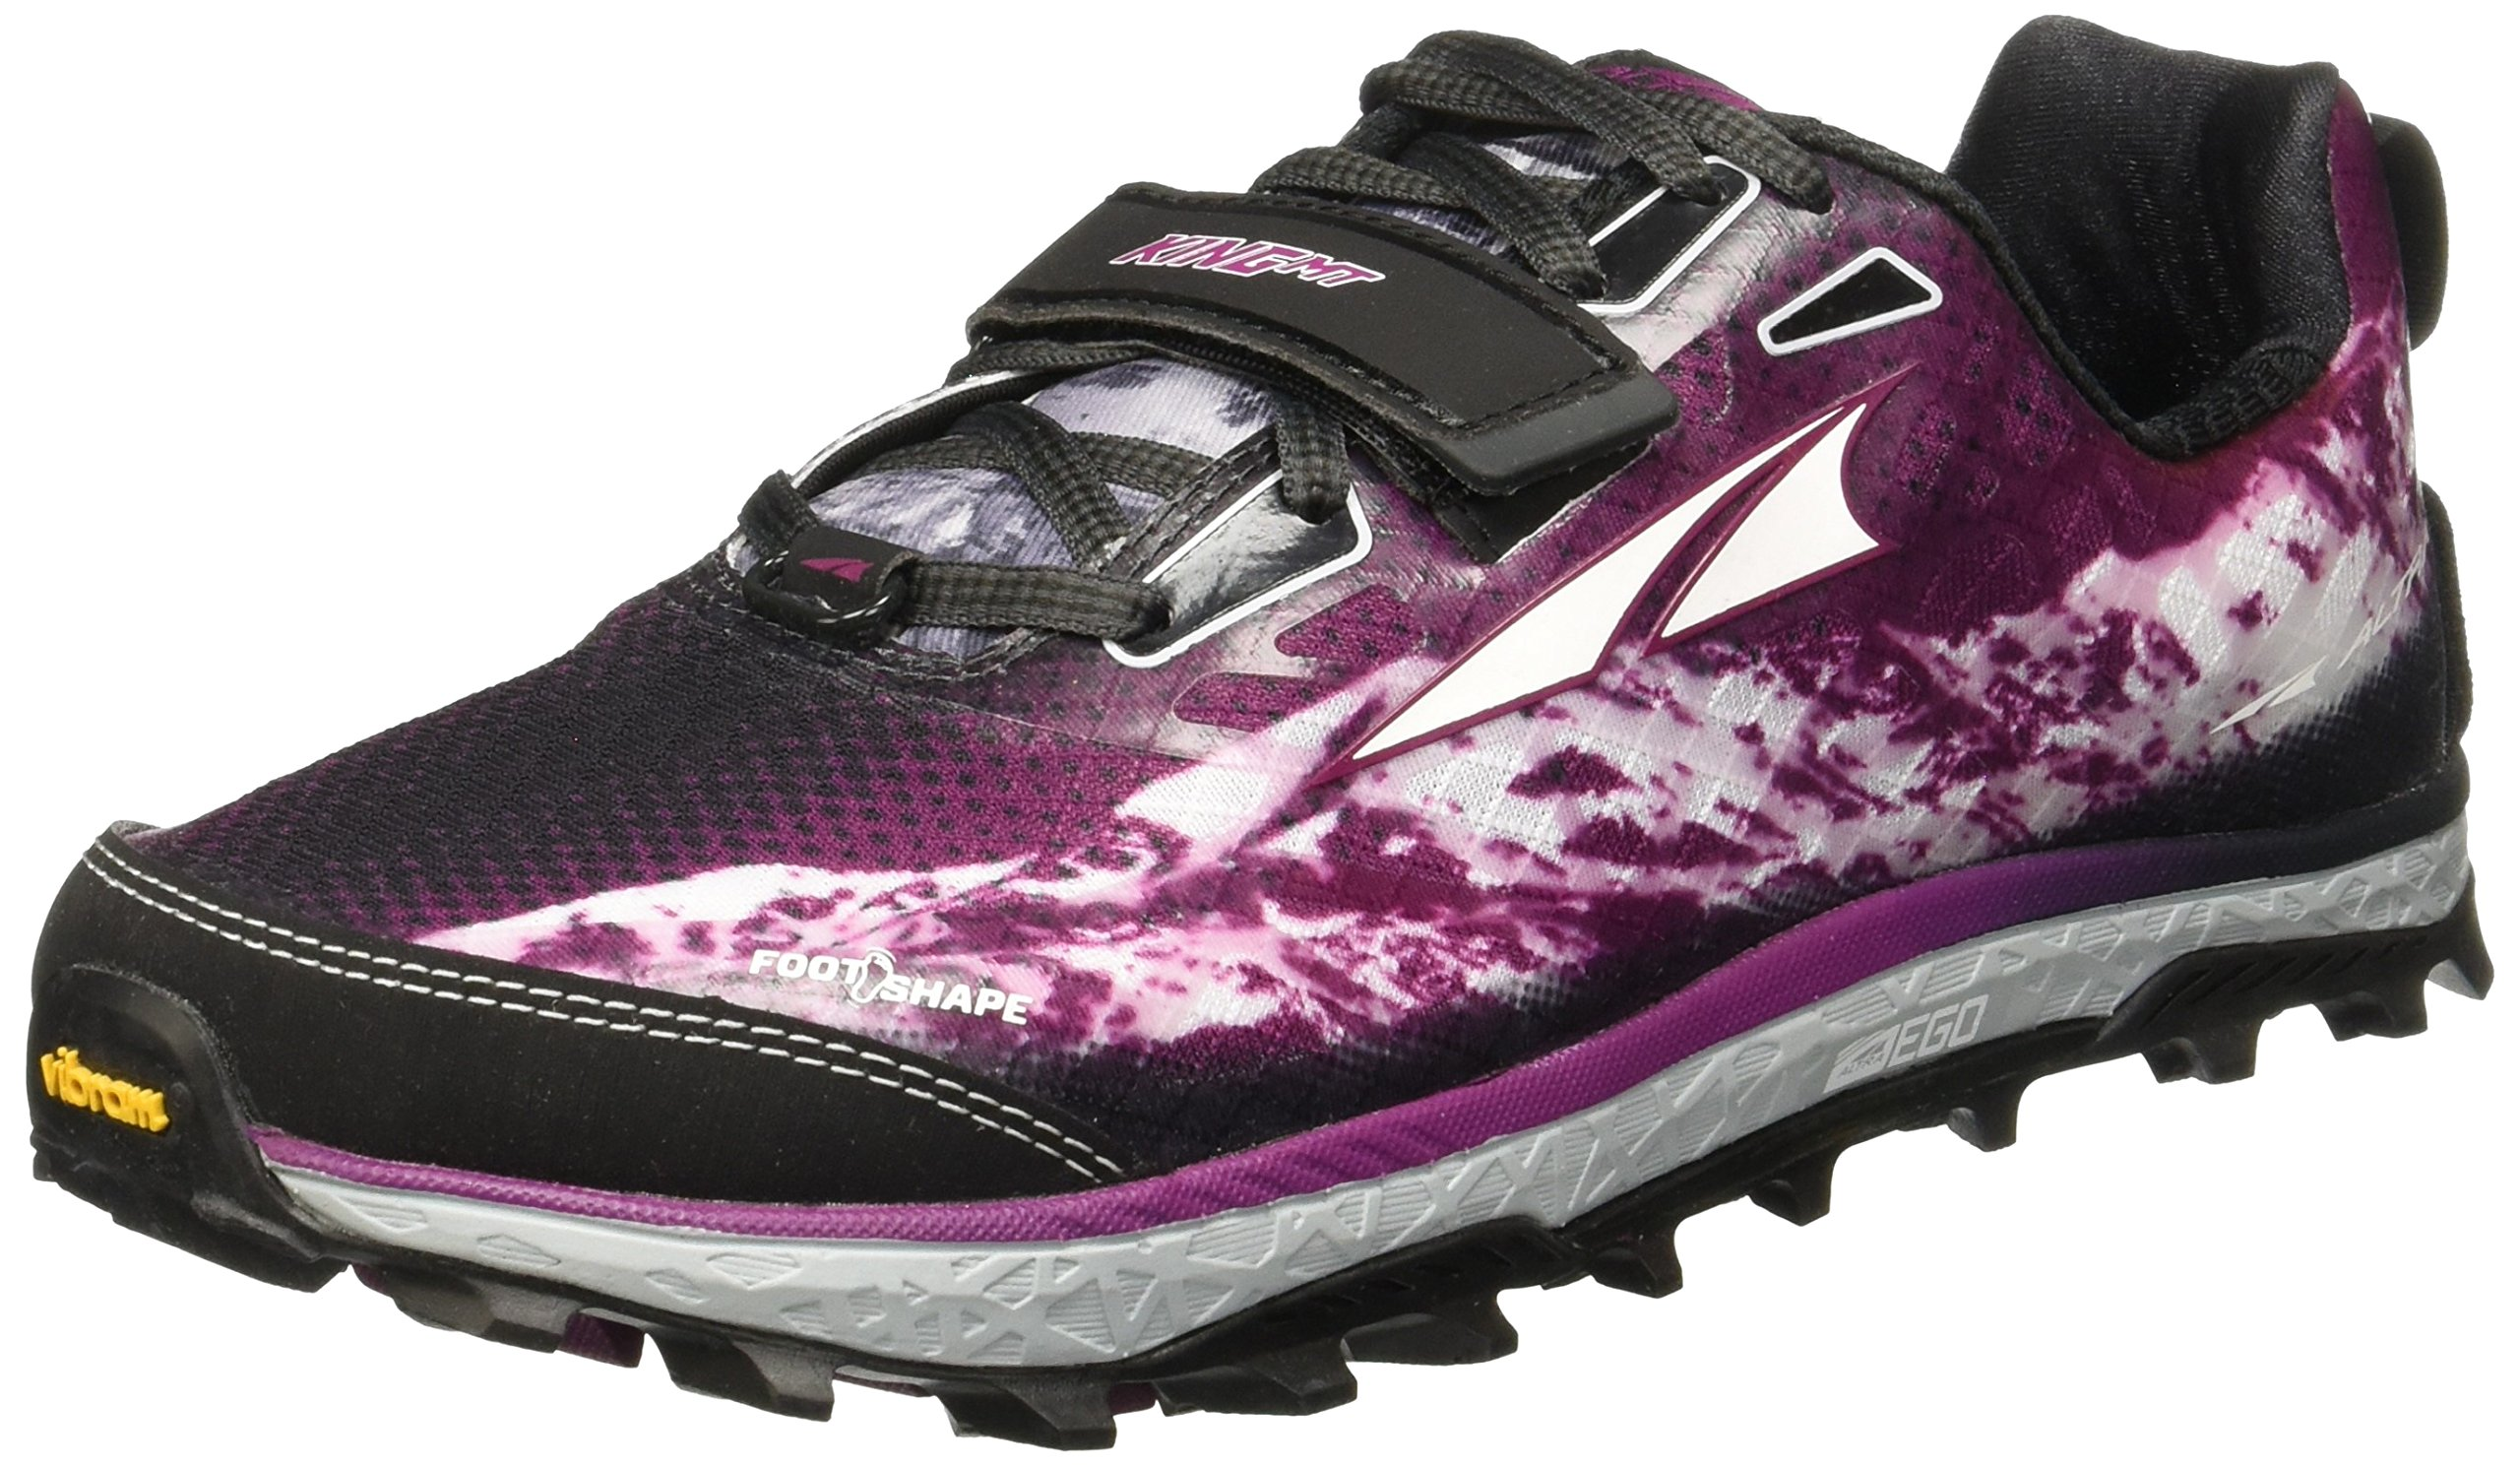 Altra King MT Trail Running Shoe - Women's Gray/Magenta 8.5